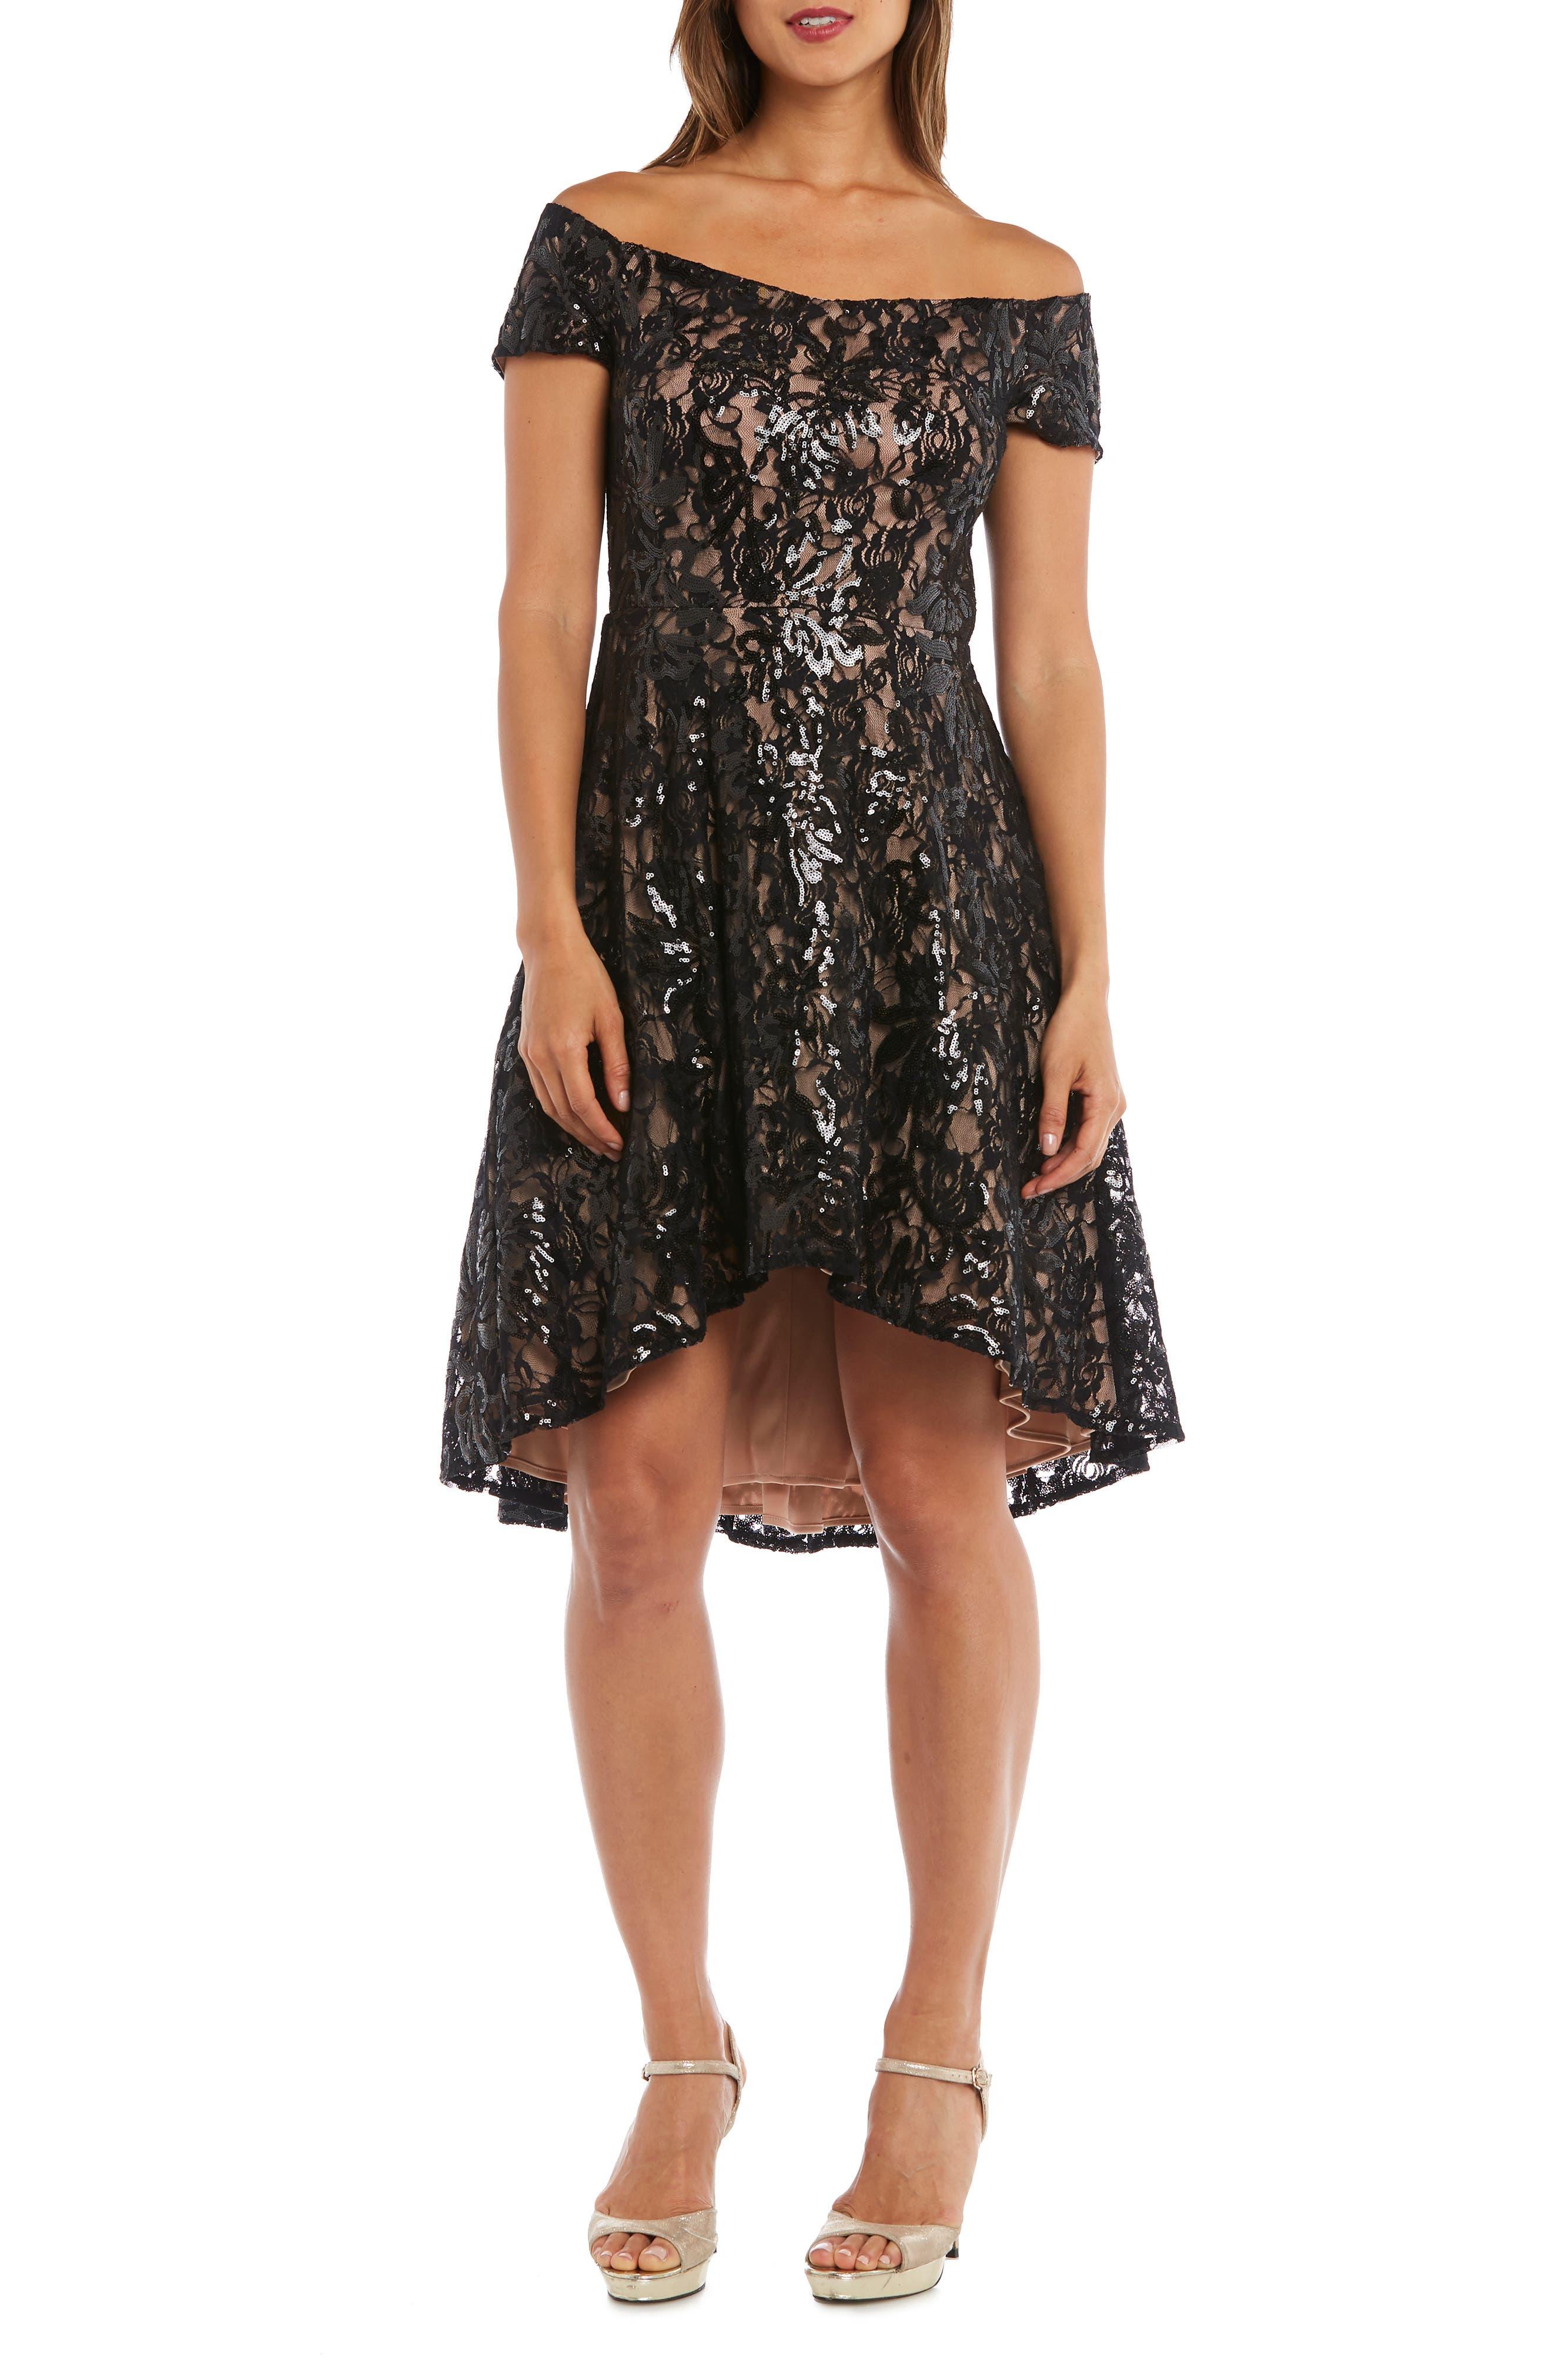 Morgan & Co. Sequin & Lace Off The Shoulder High/low Dress, Black